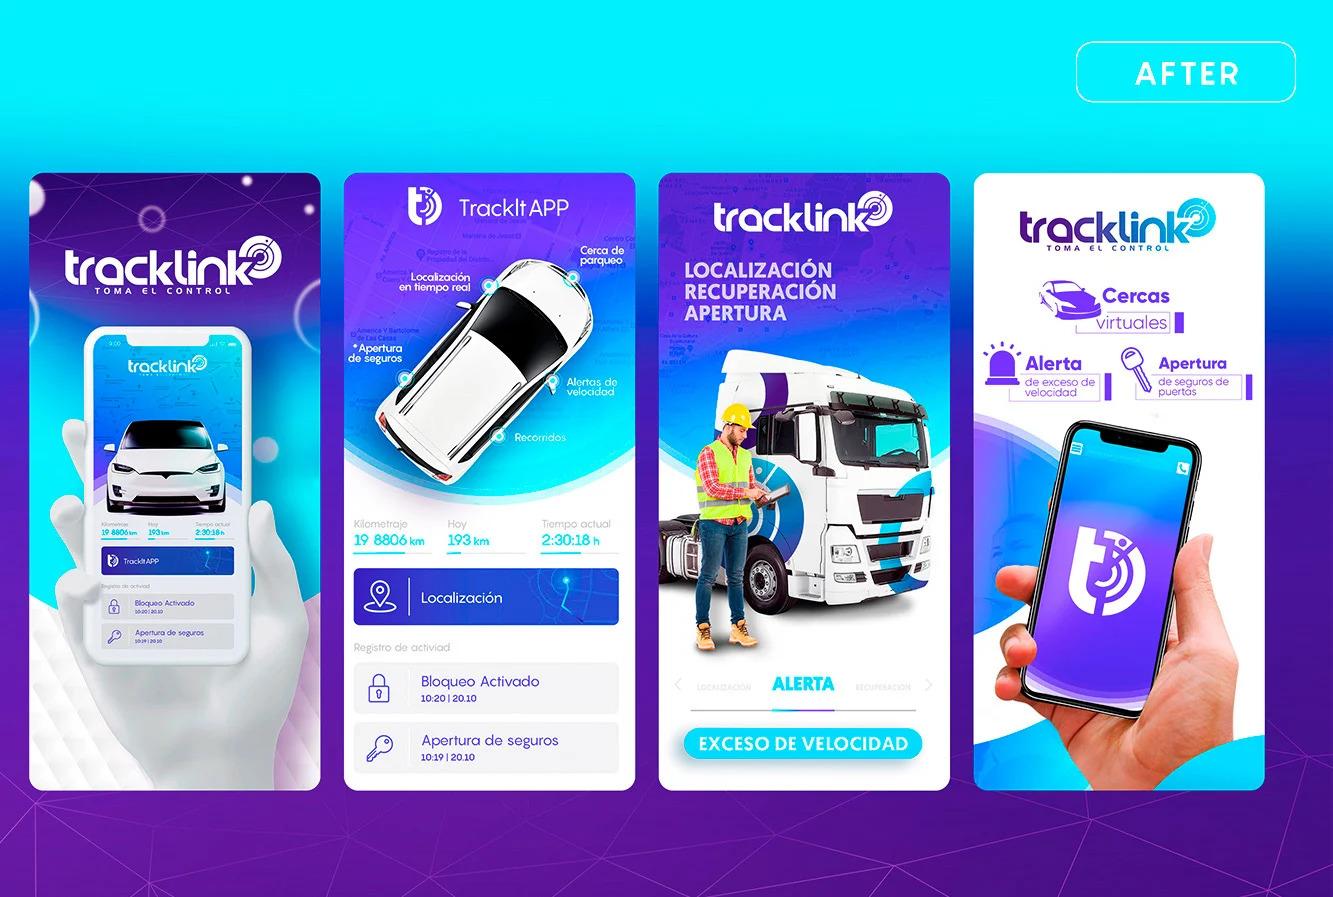 Tracklink Centrico Digital Branding